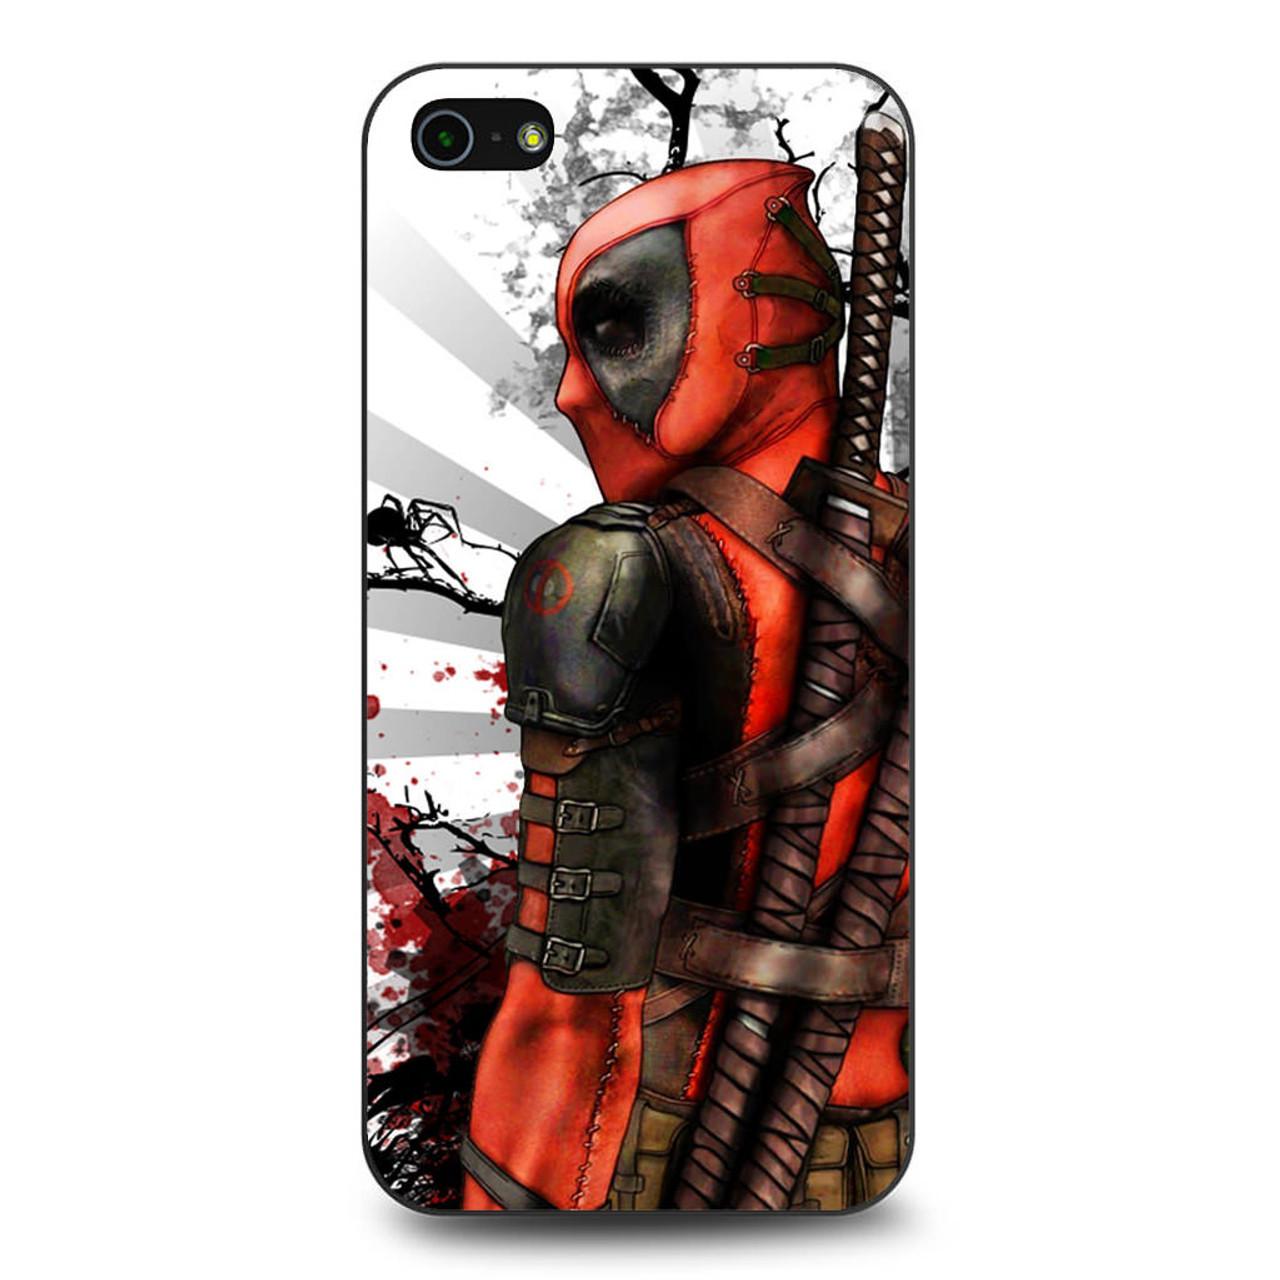 new product 27516 20c49 Deadpool Art iPhone 5/5S/SE Case